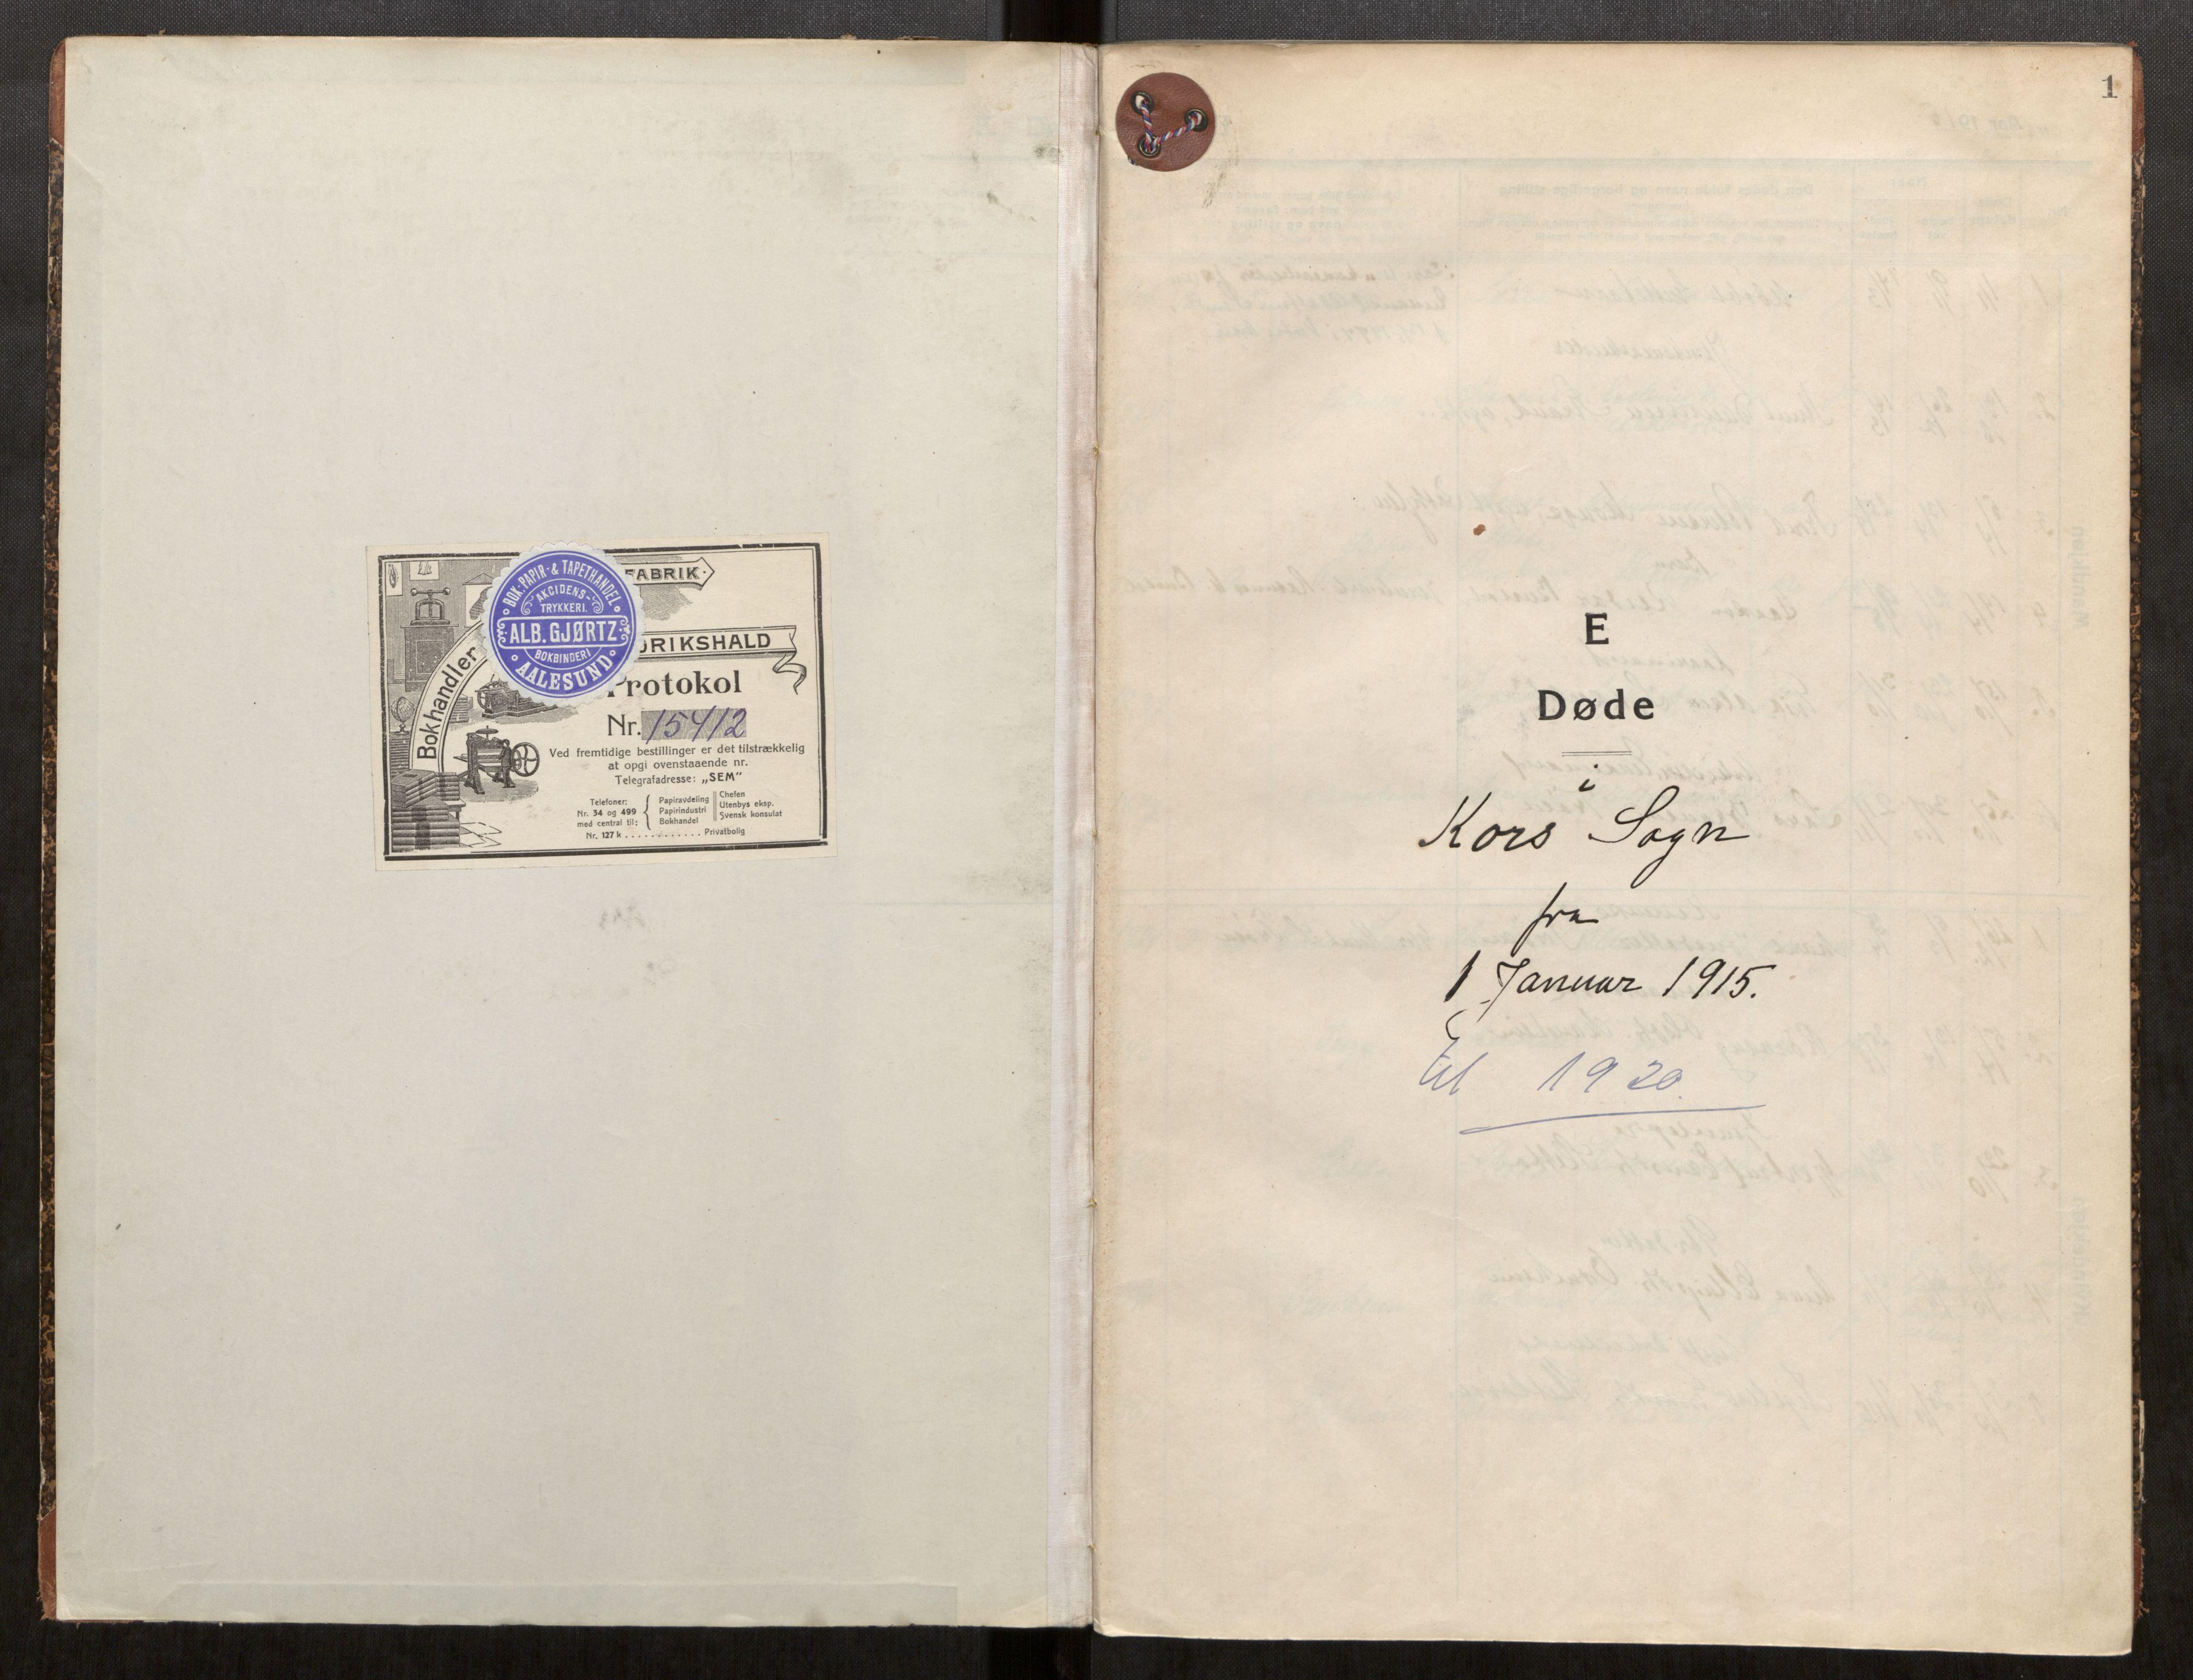 SAT, Grytten sokneprestkontor, Ministerialbok nr. 546A05, 1915-1920, s. 1